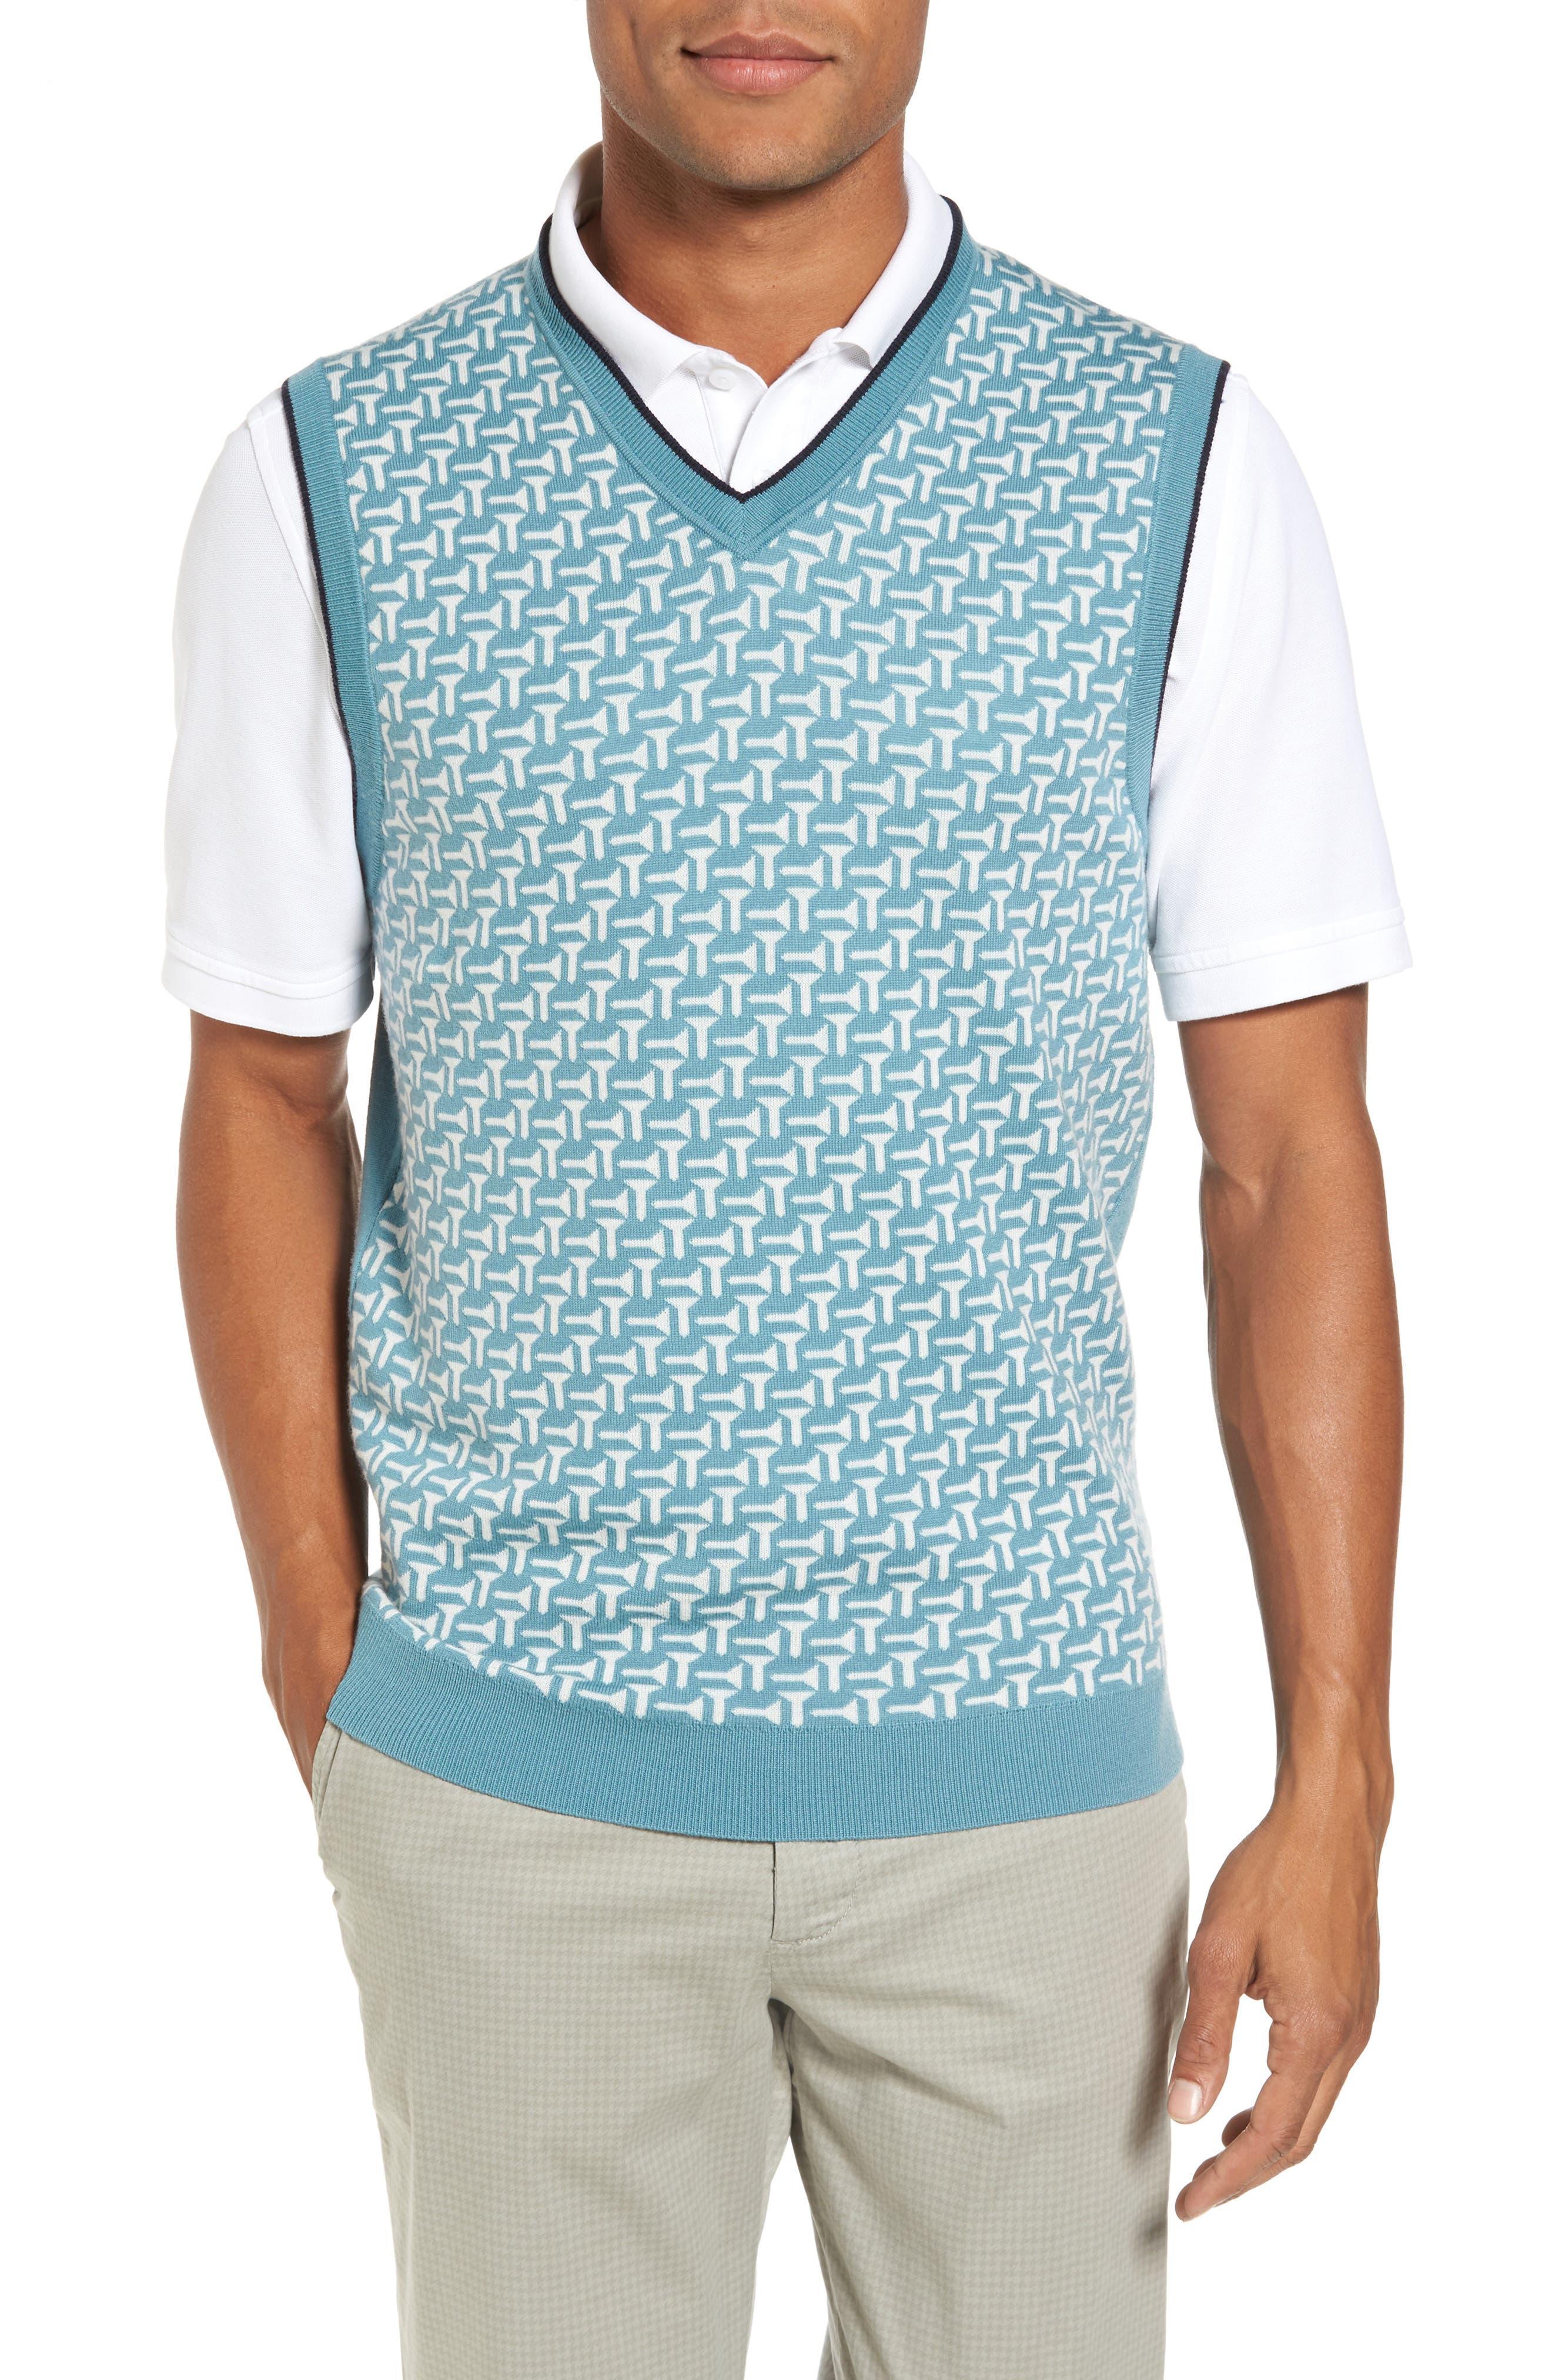 Tommas Golf Merino Sweater Vest,                             Main thumbnail 1, color,                             331